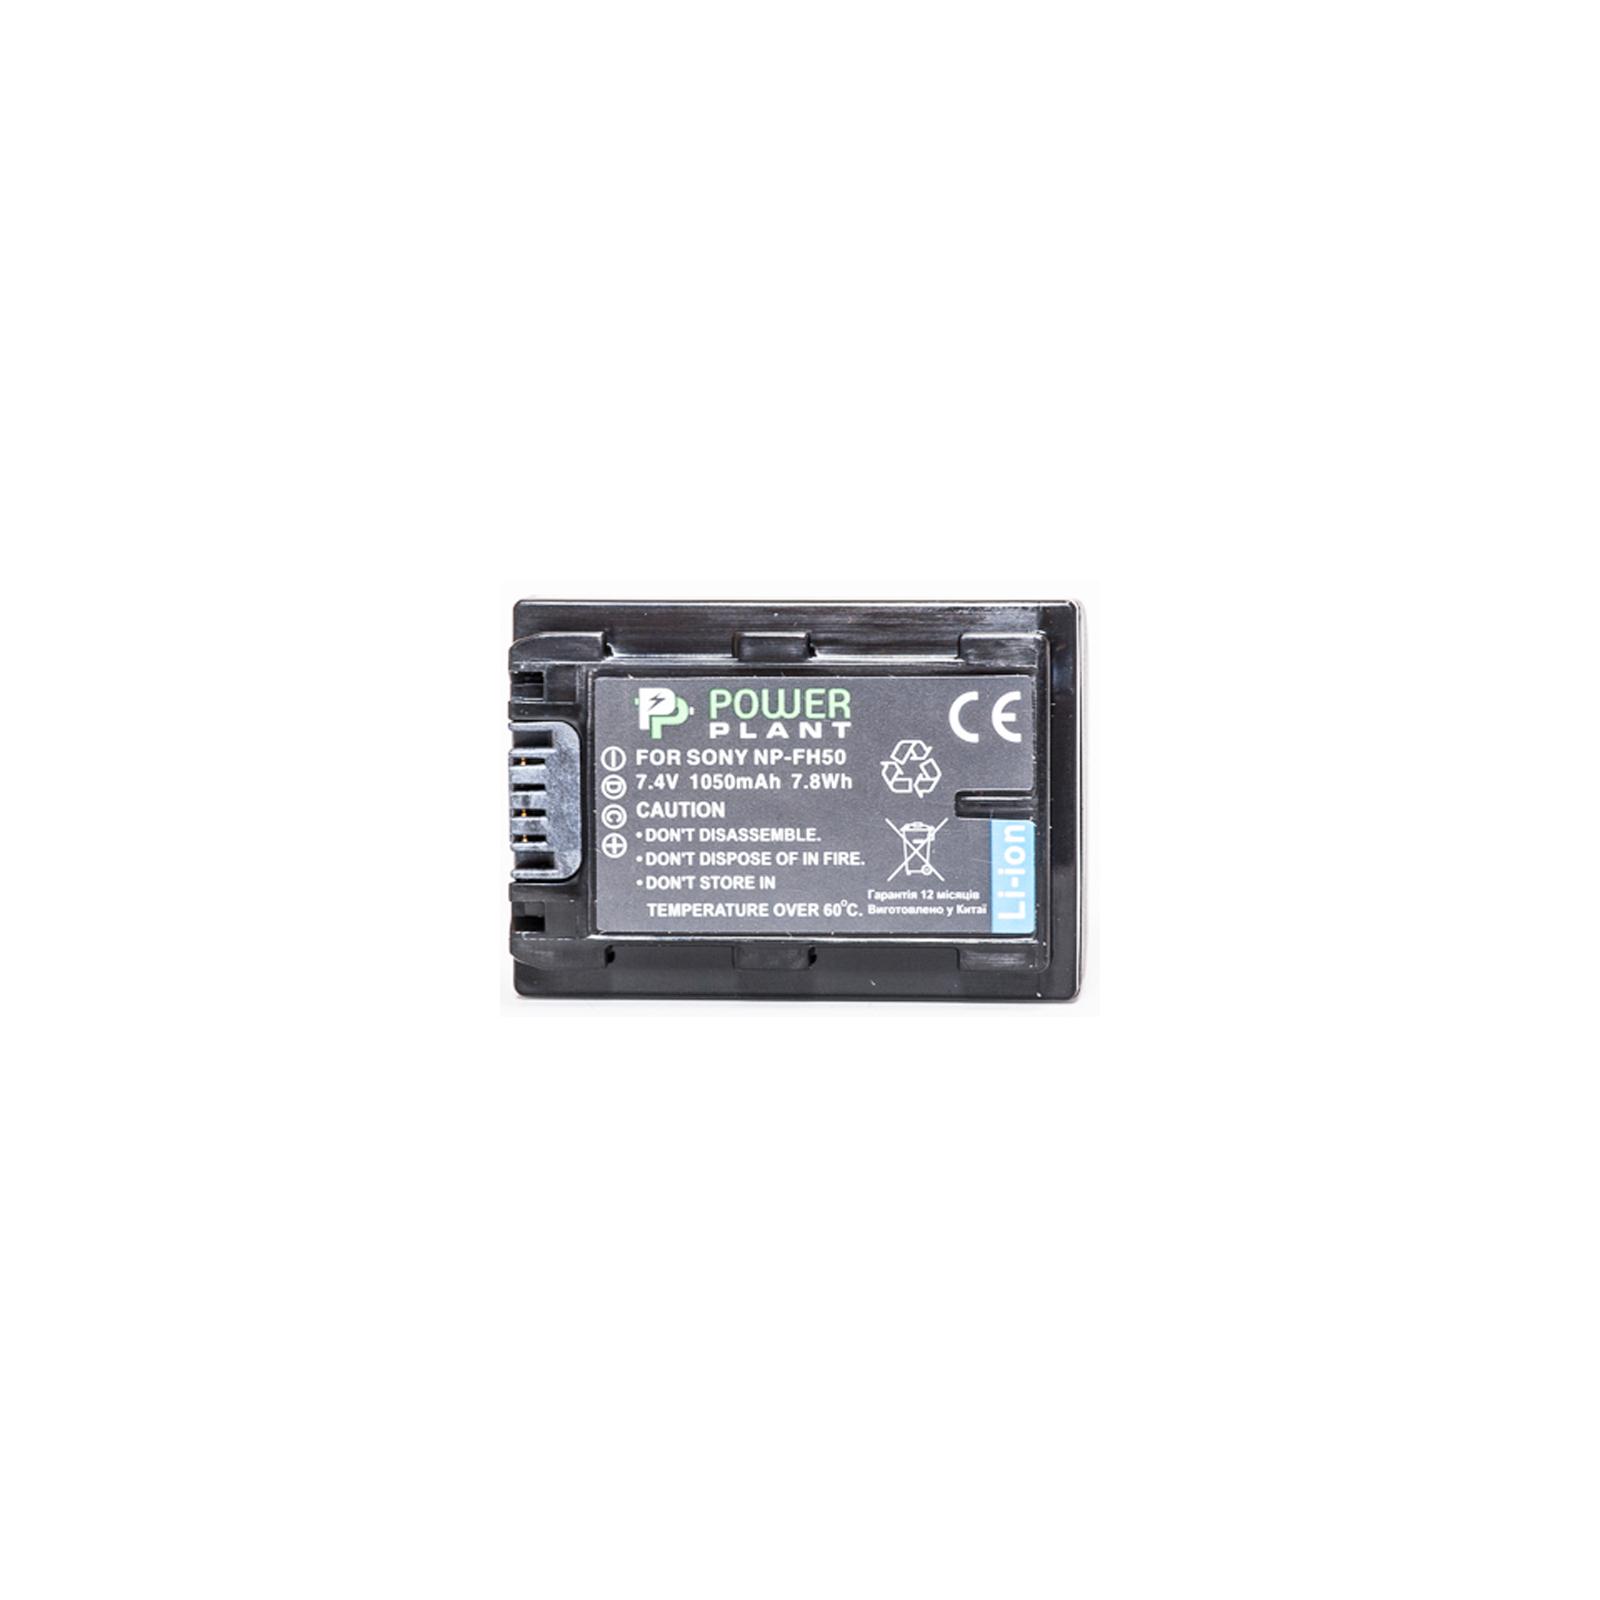 Аккумулятор к фото/видео PowerPlant Sony NP-FH50 (DV00DV1208) изображение 2